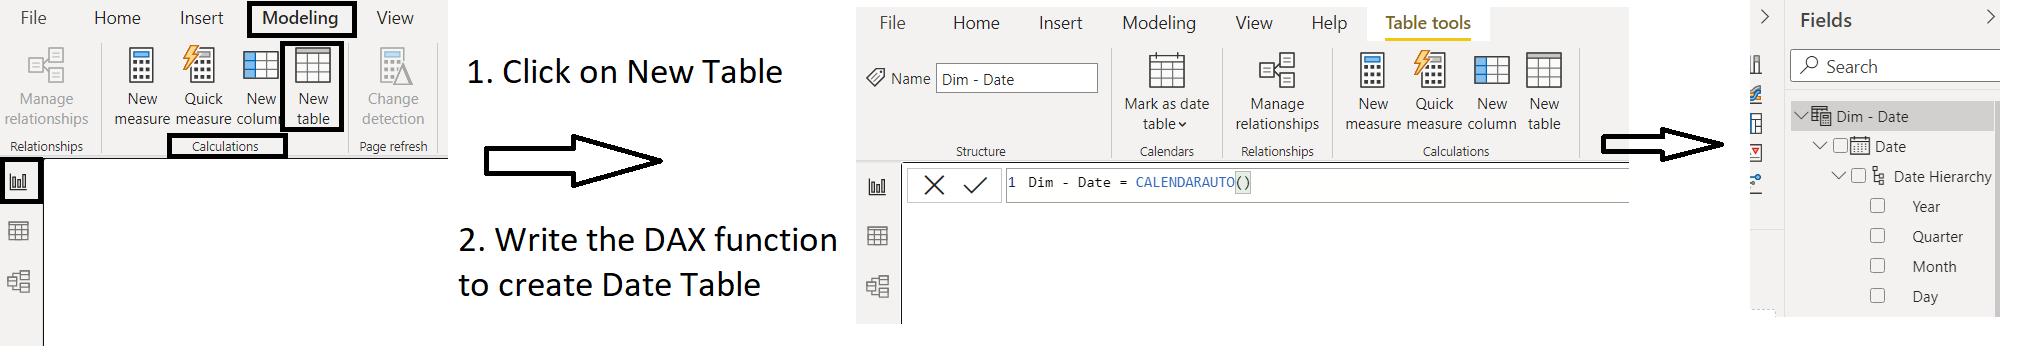 Date Table in Power BI using DAX